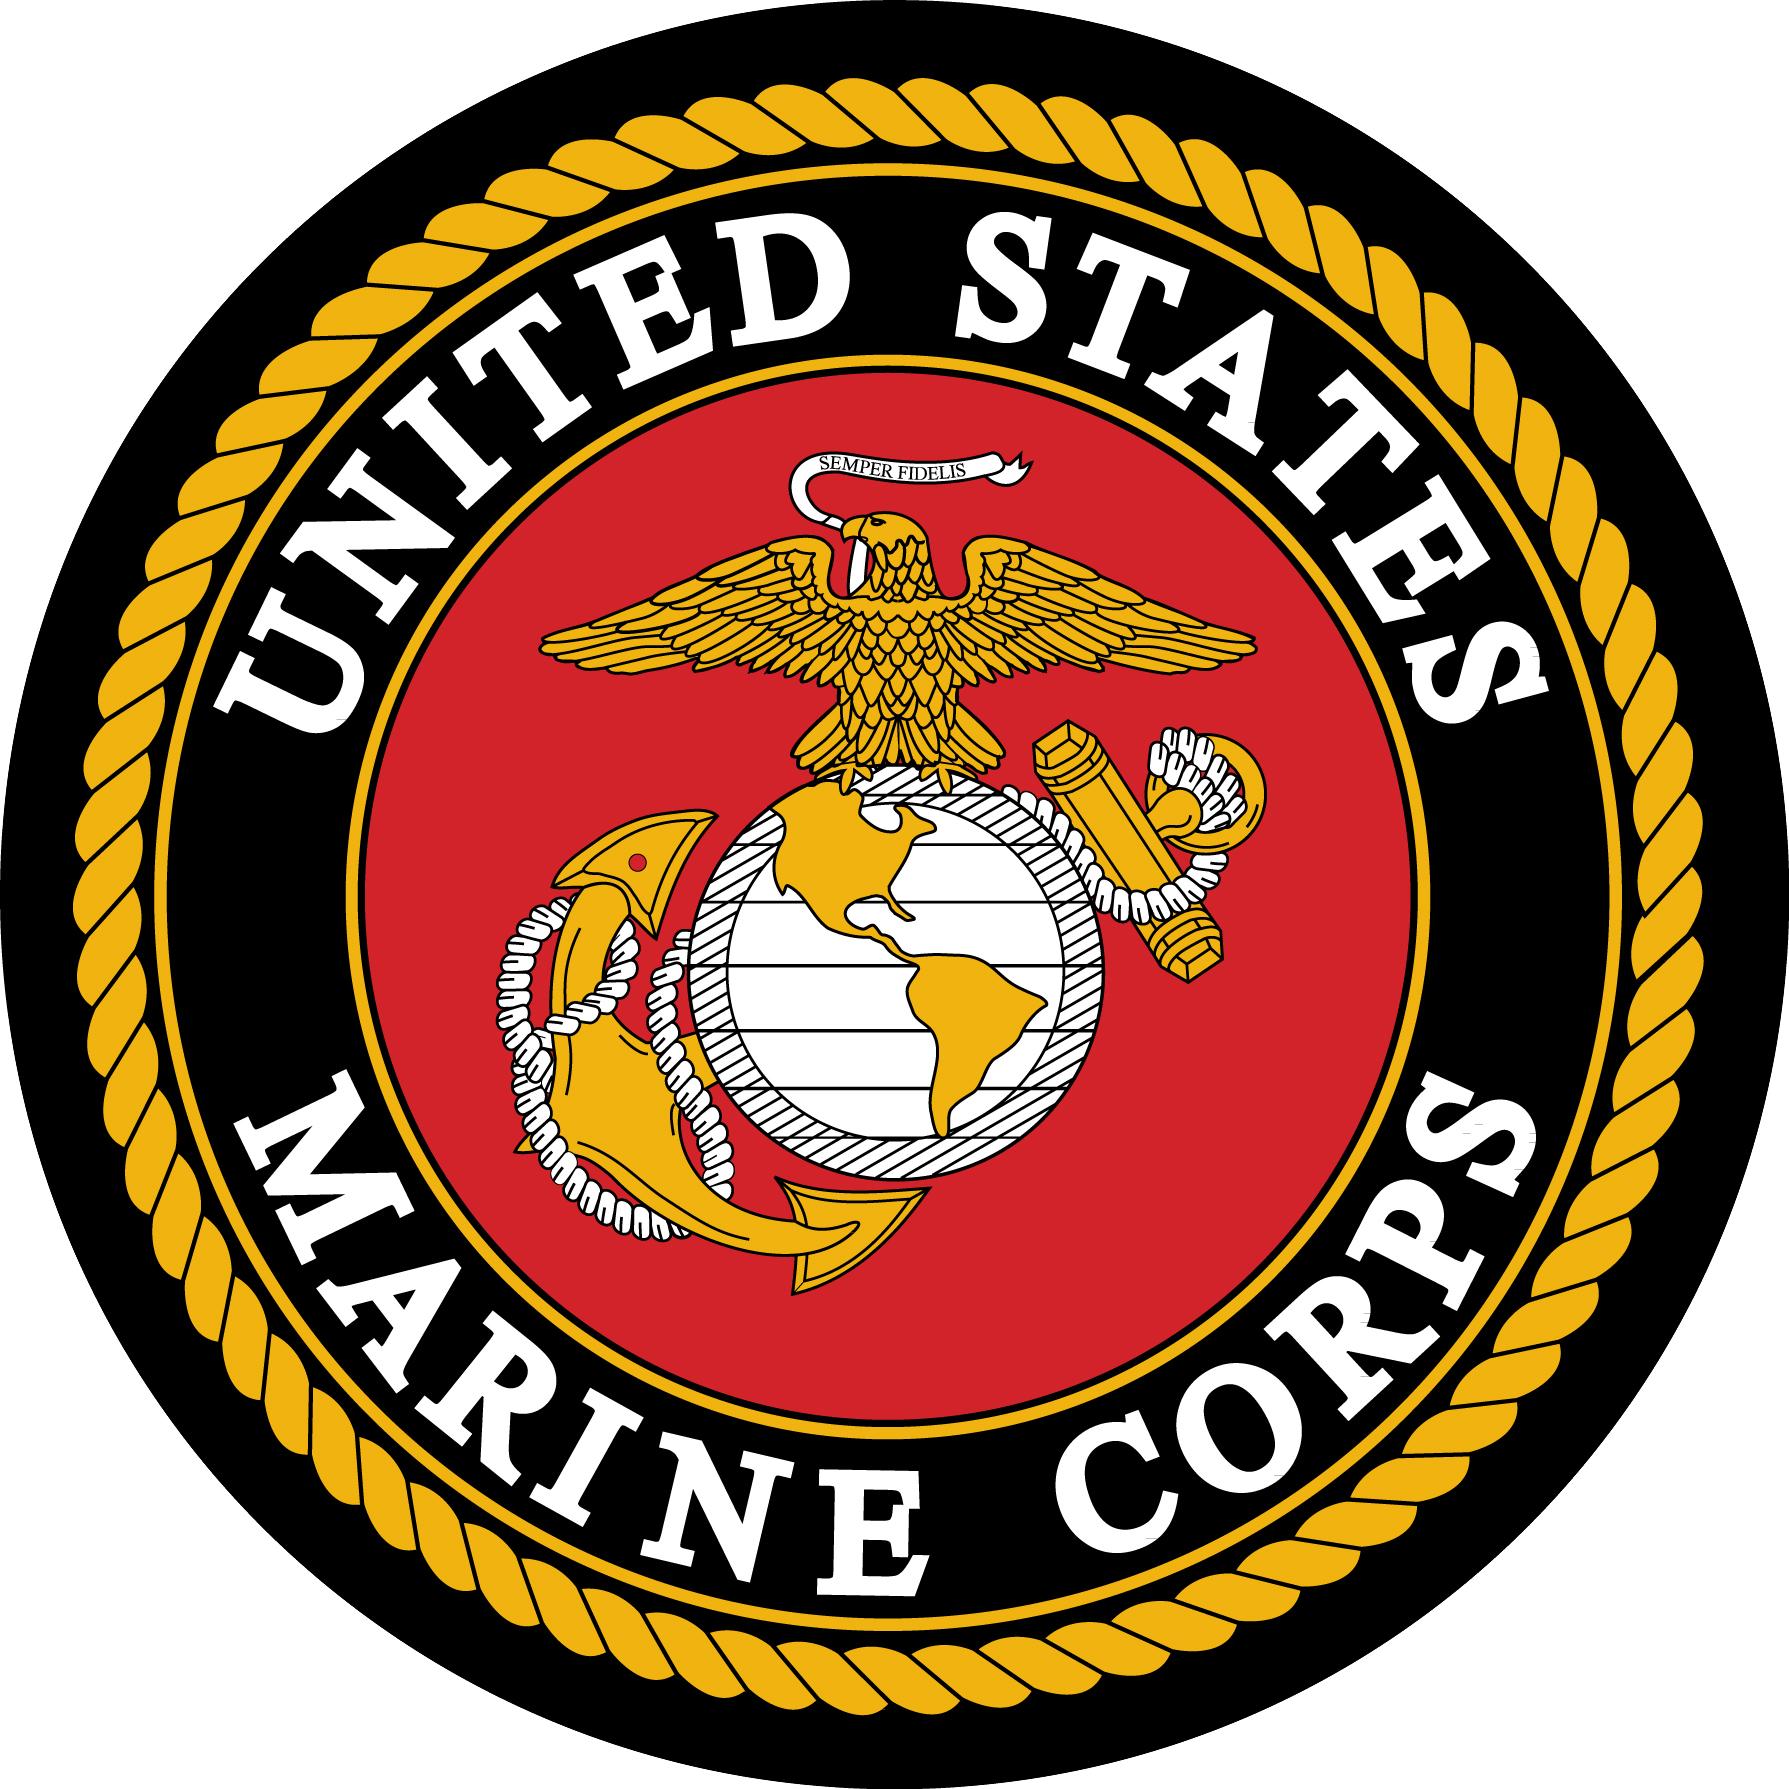 Marine clipart insignia Us Clipart Us Marine Corps